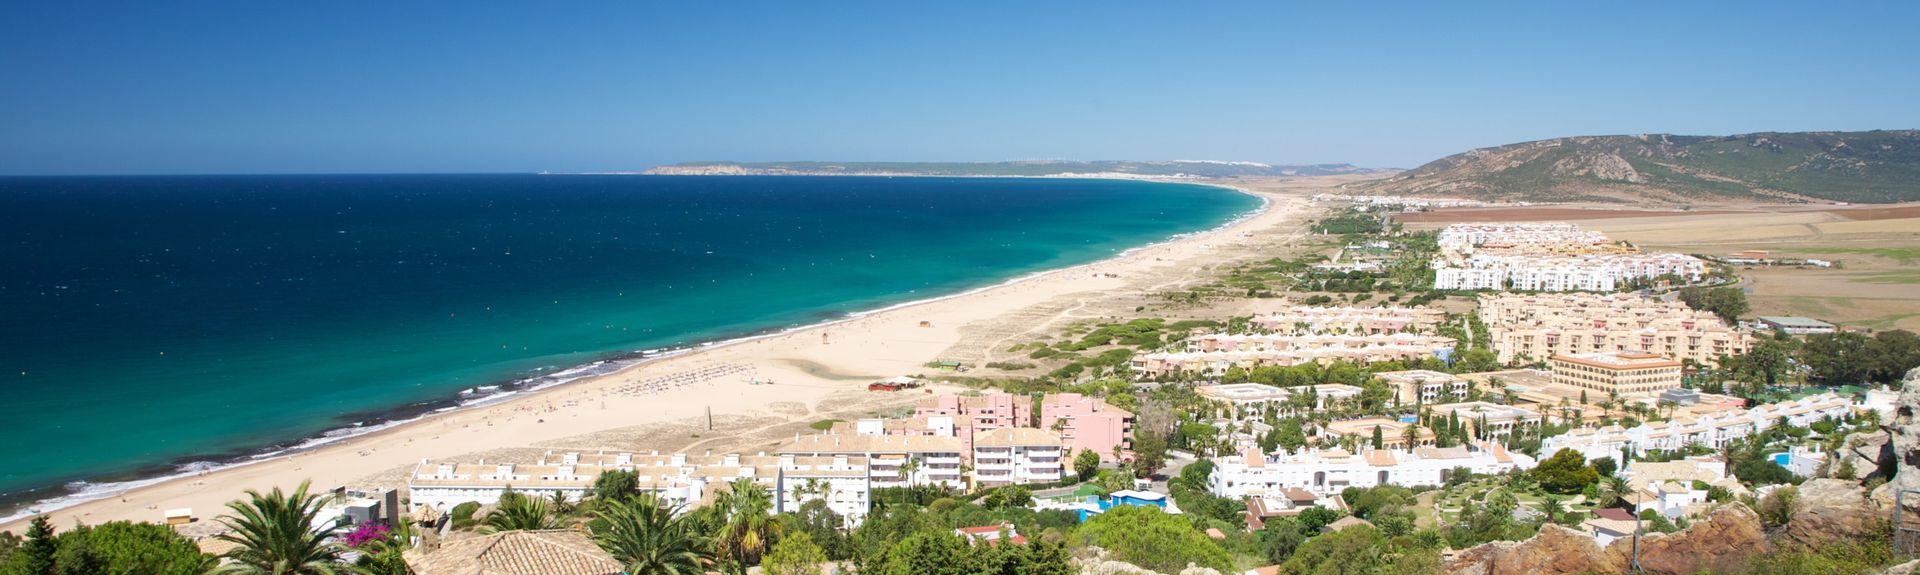 Cadiz (province), Andalusia, Spain